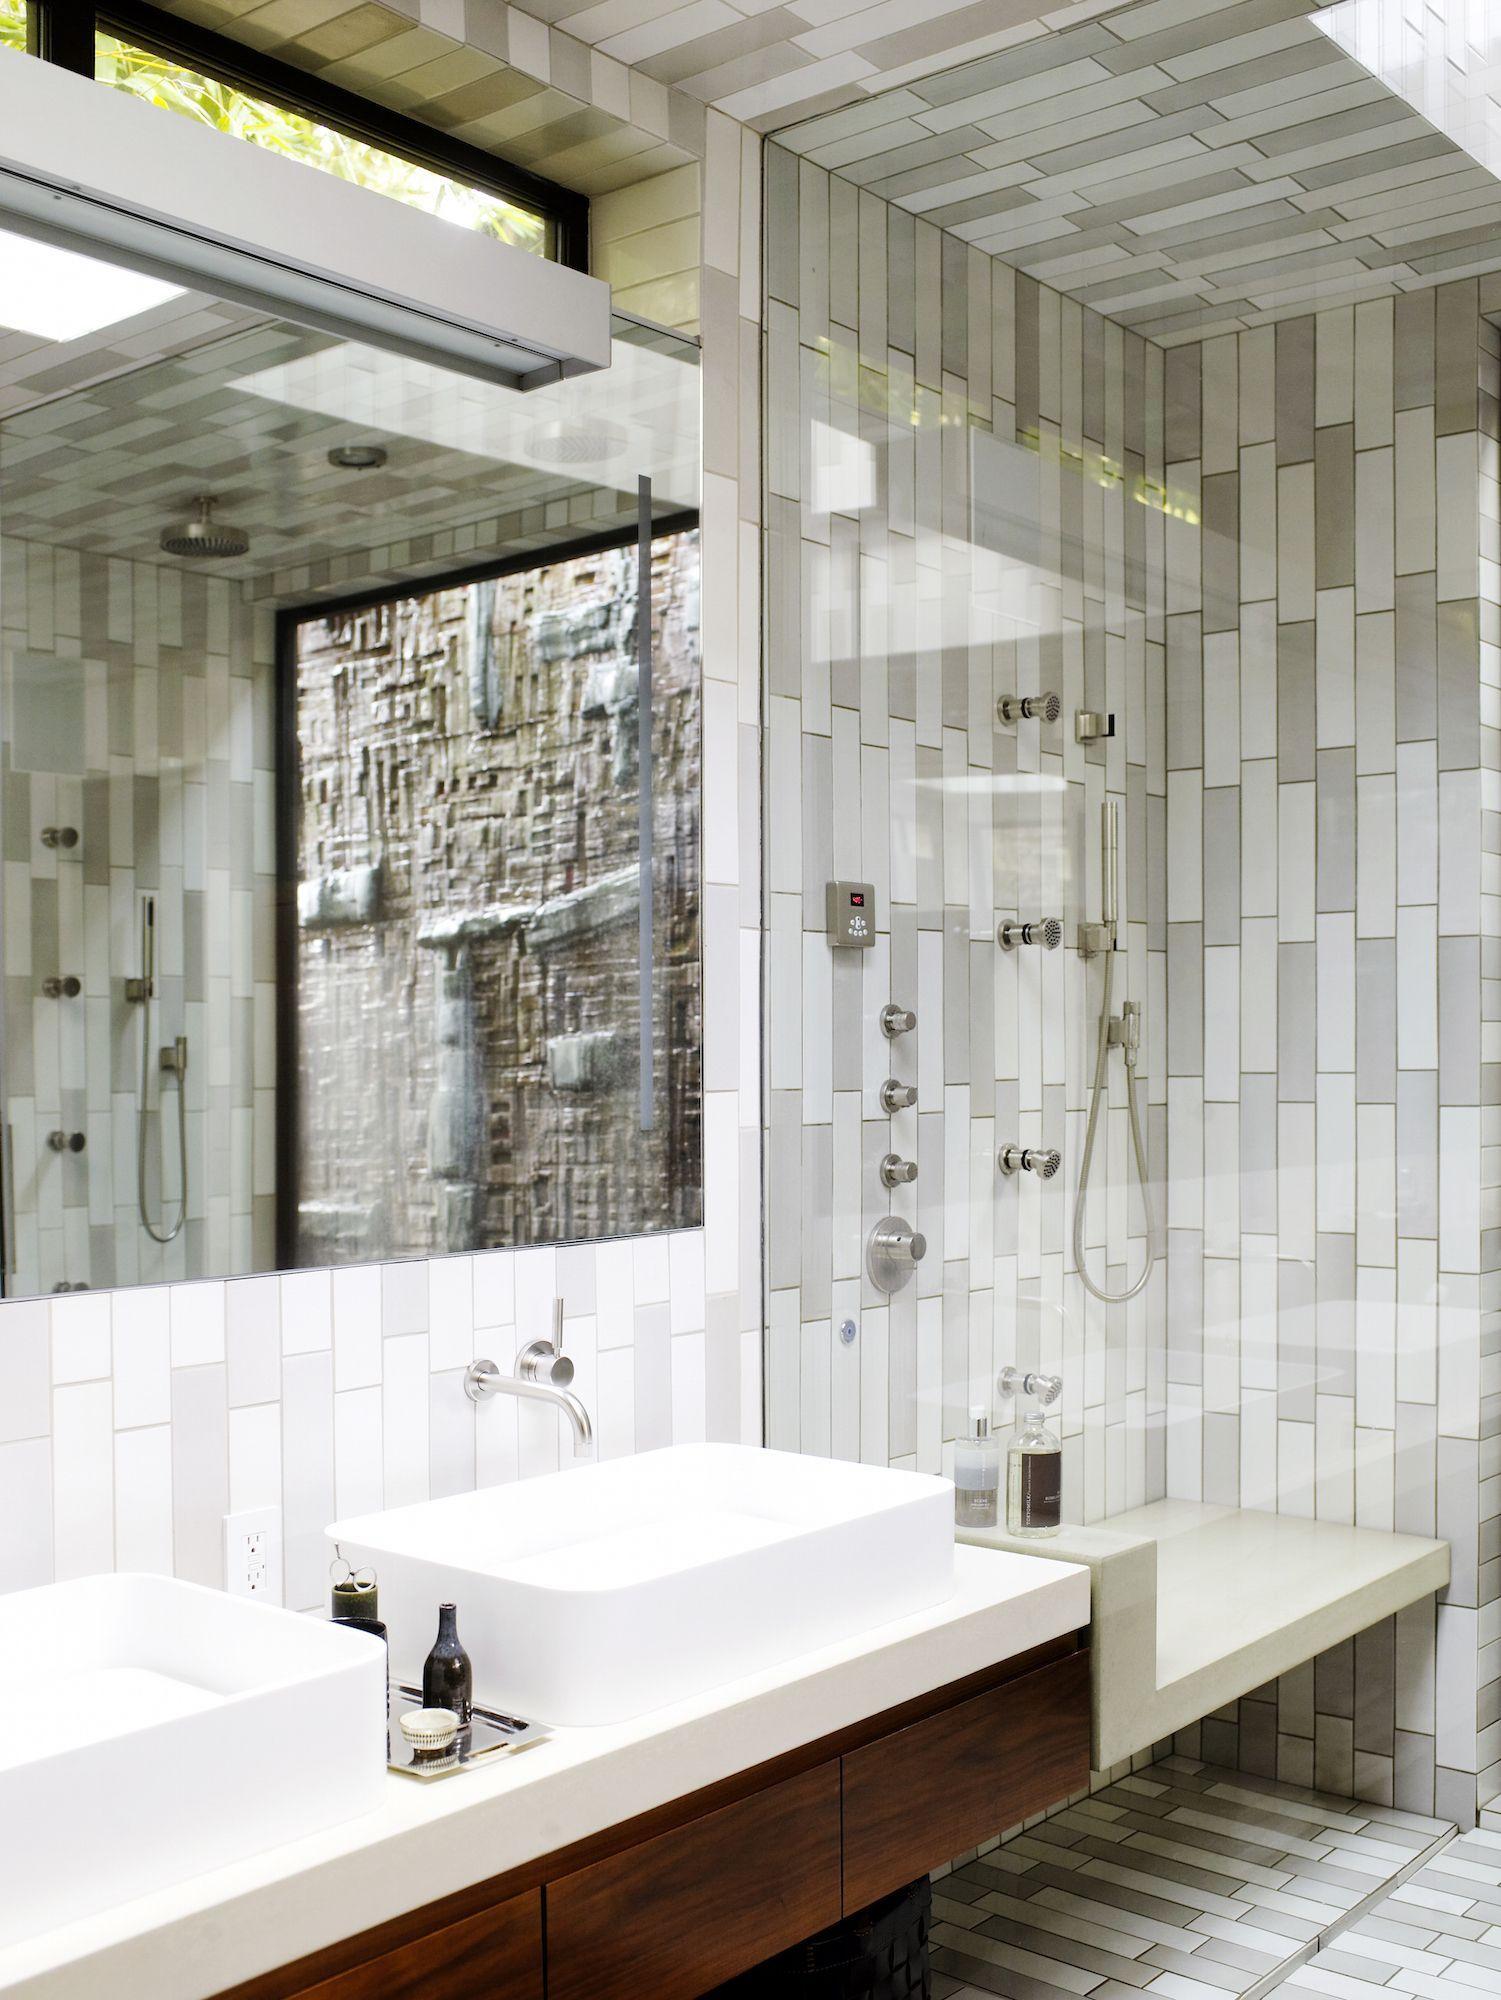 8 Bathroom Tile Trends To Keep A